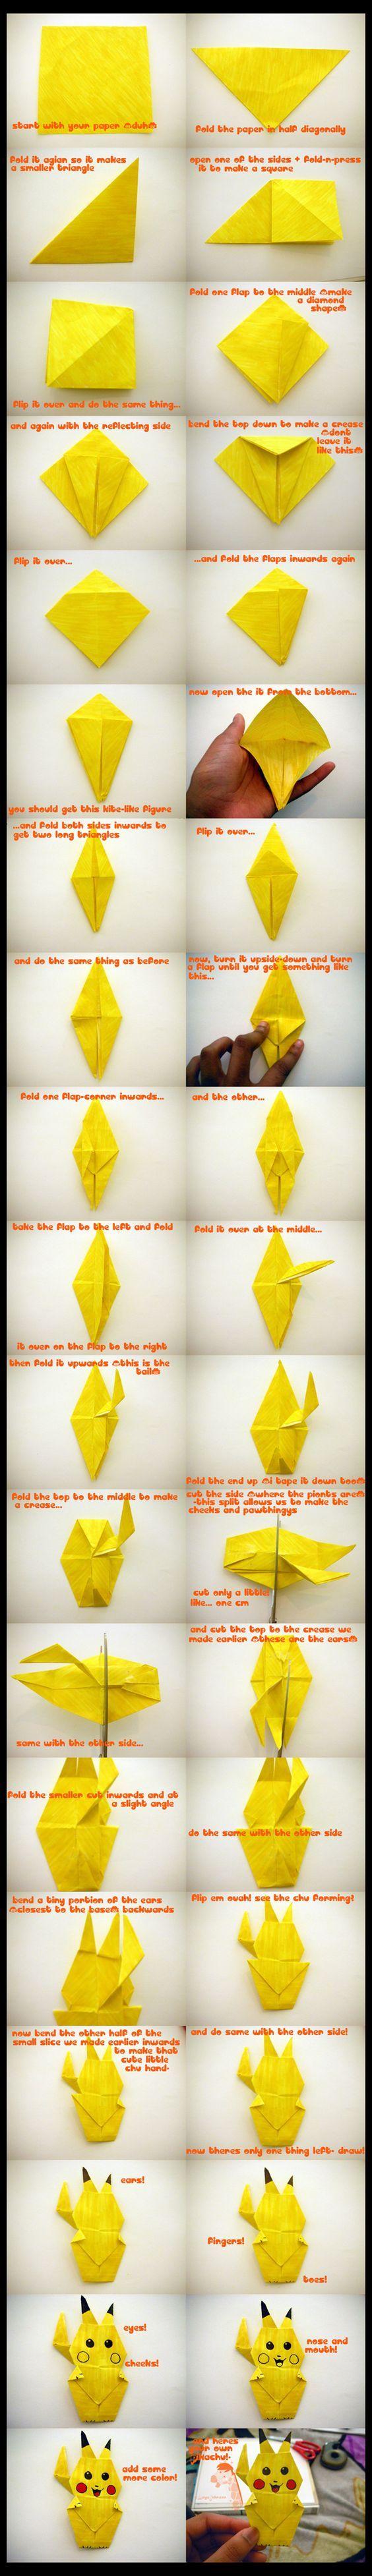 iblock fun pikachu instructions